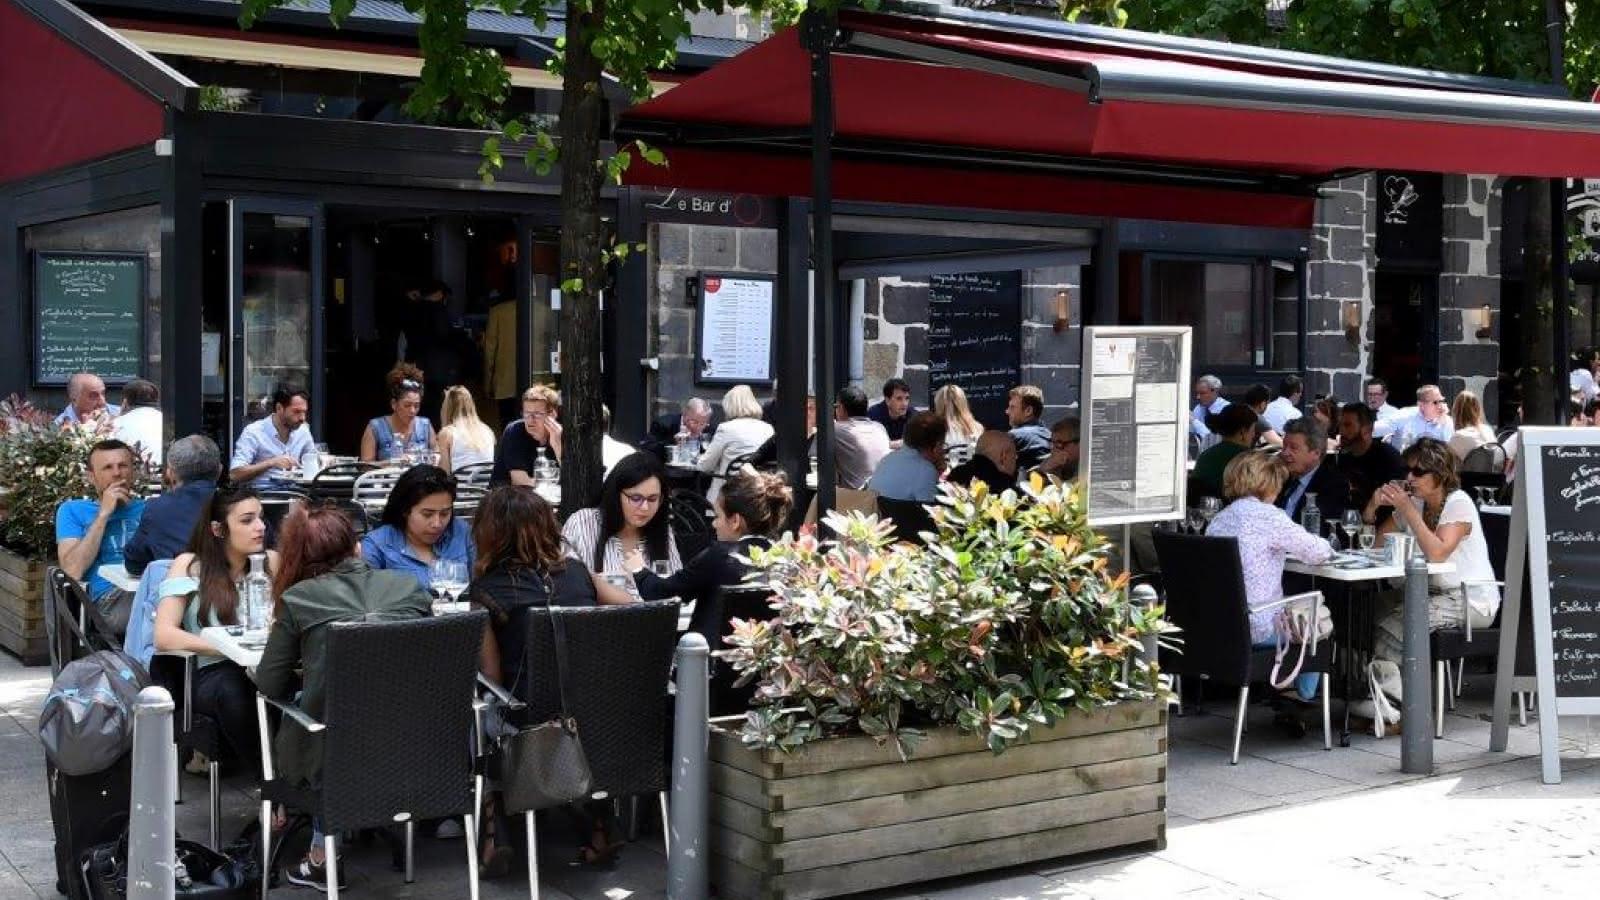 © Terrasse - Restaurant - Le bar d'O